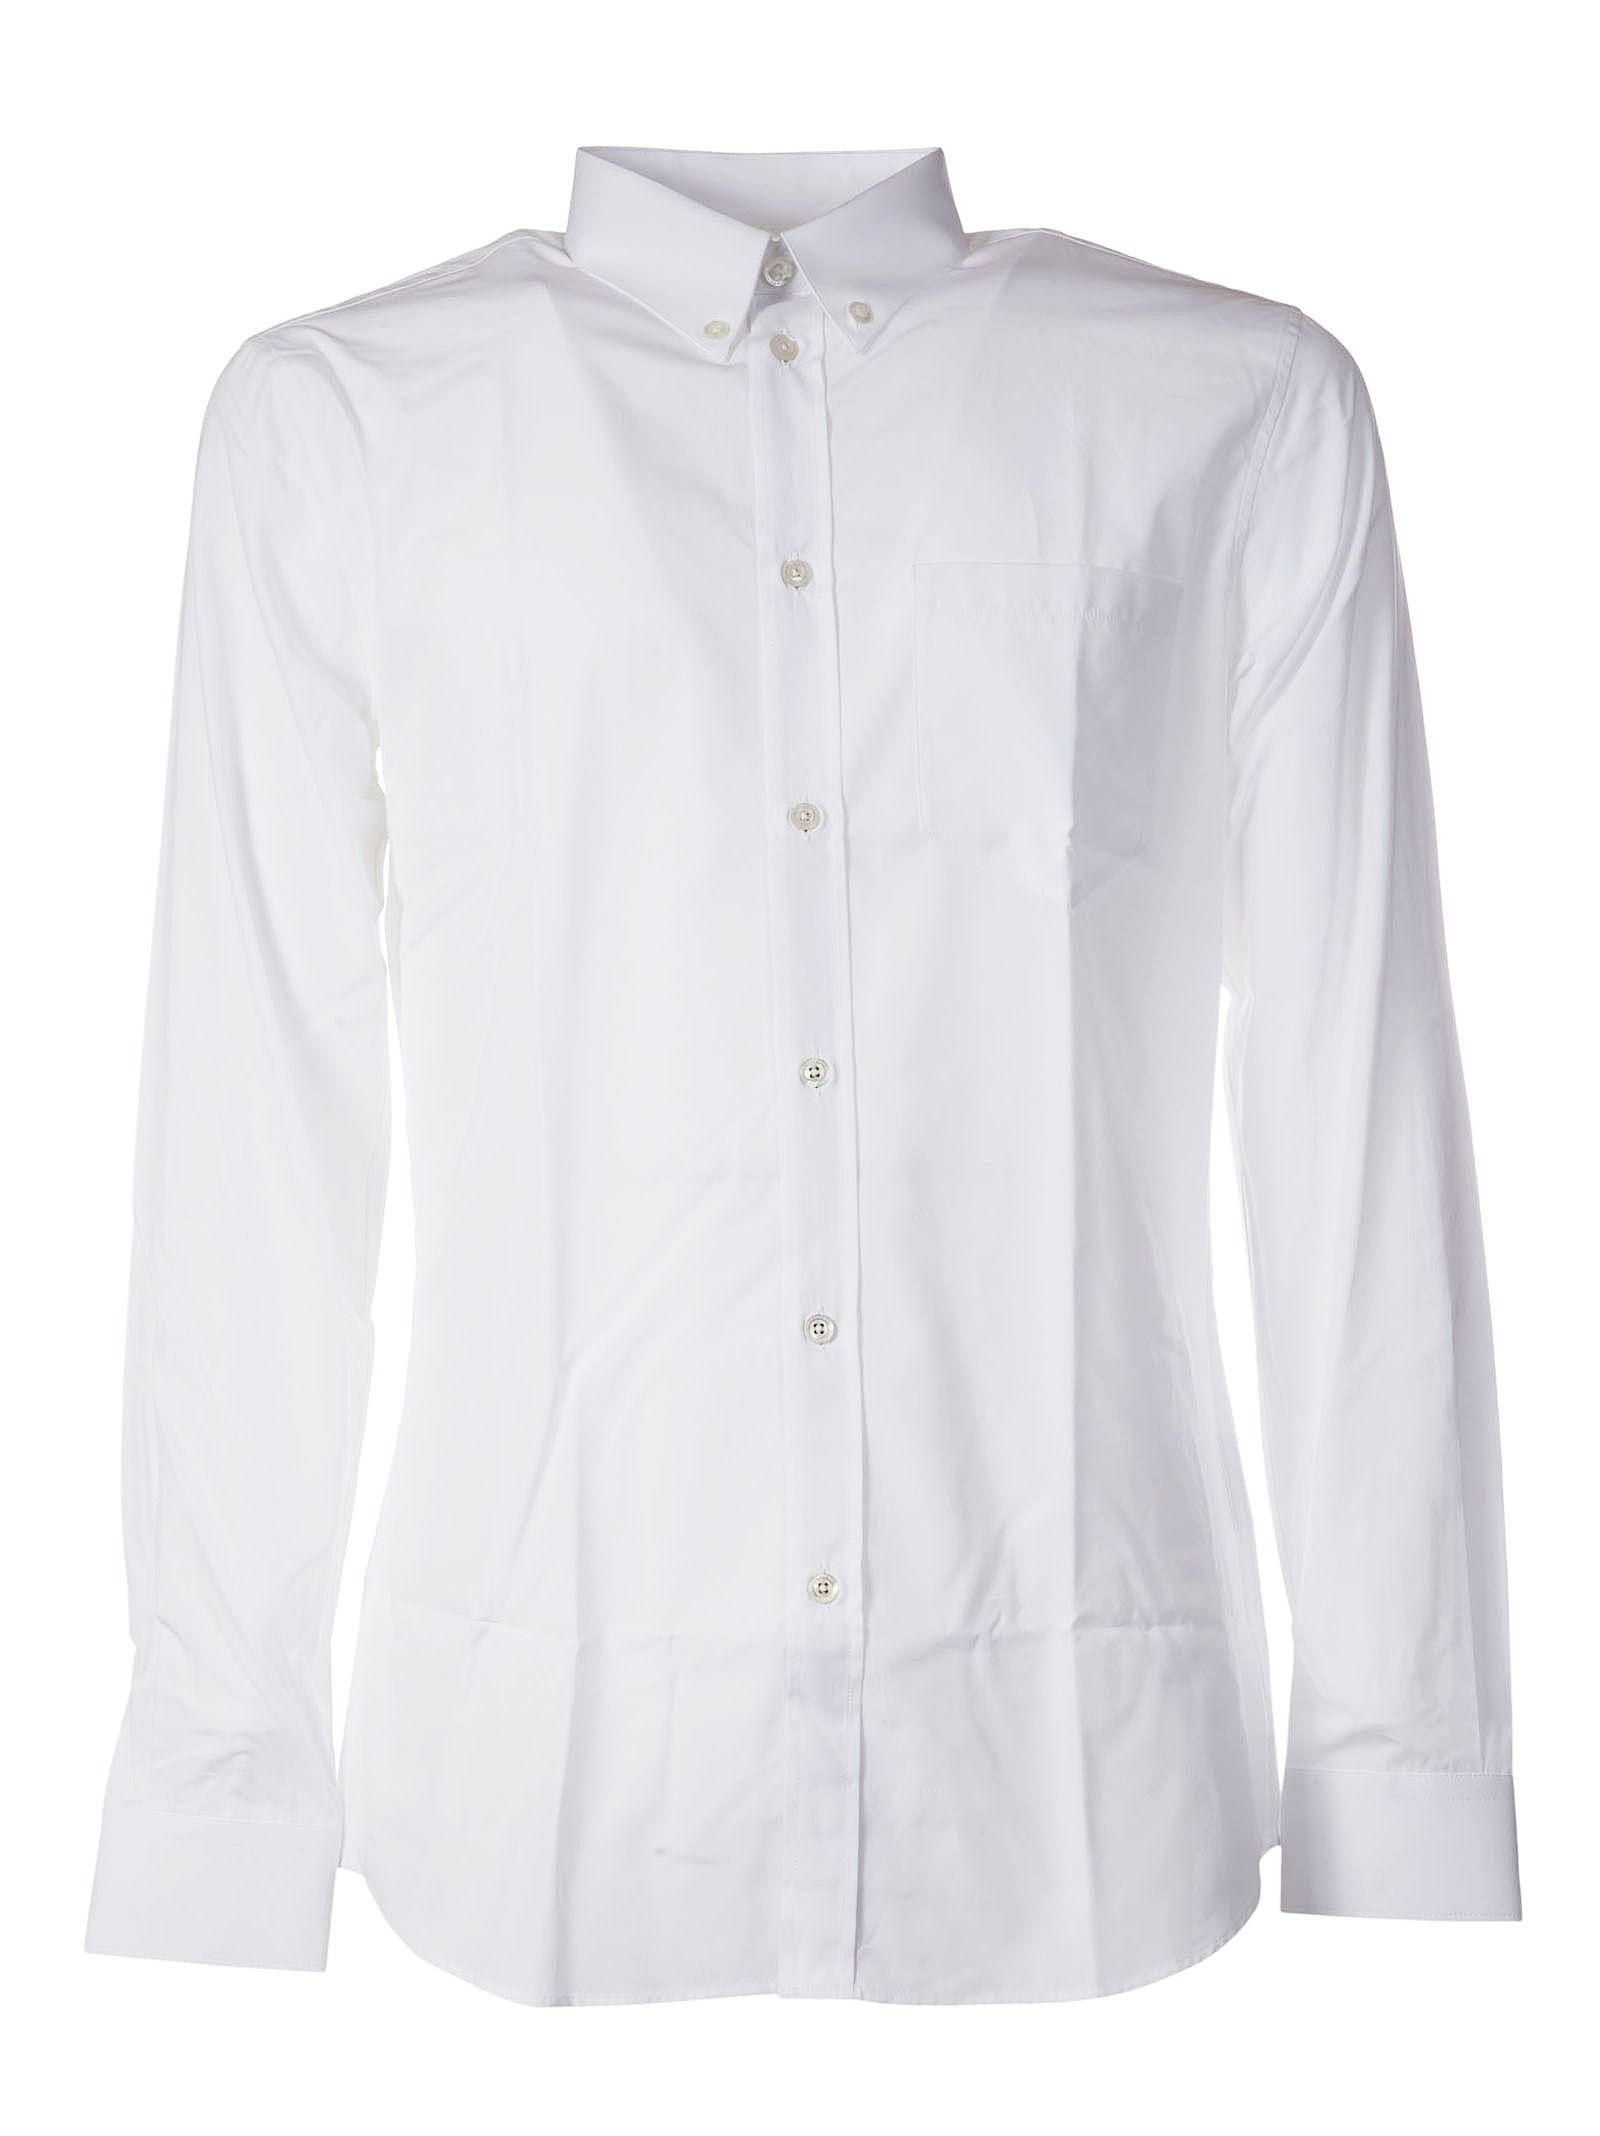 Givenchy Striped Trim Classic Shirt